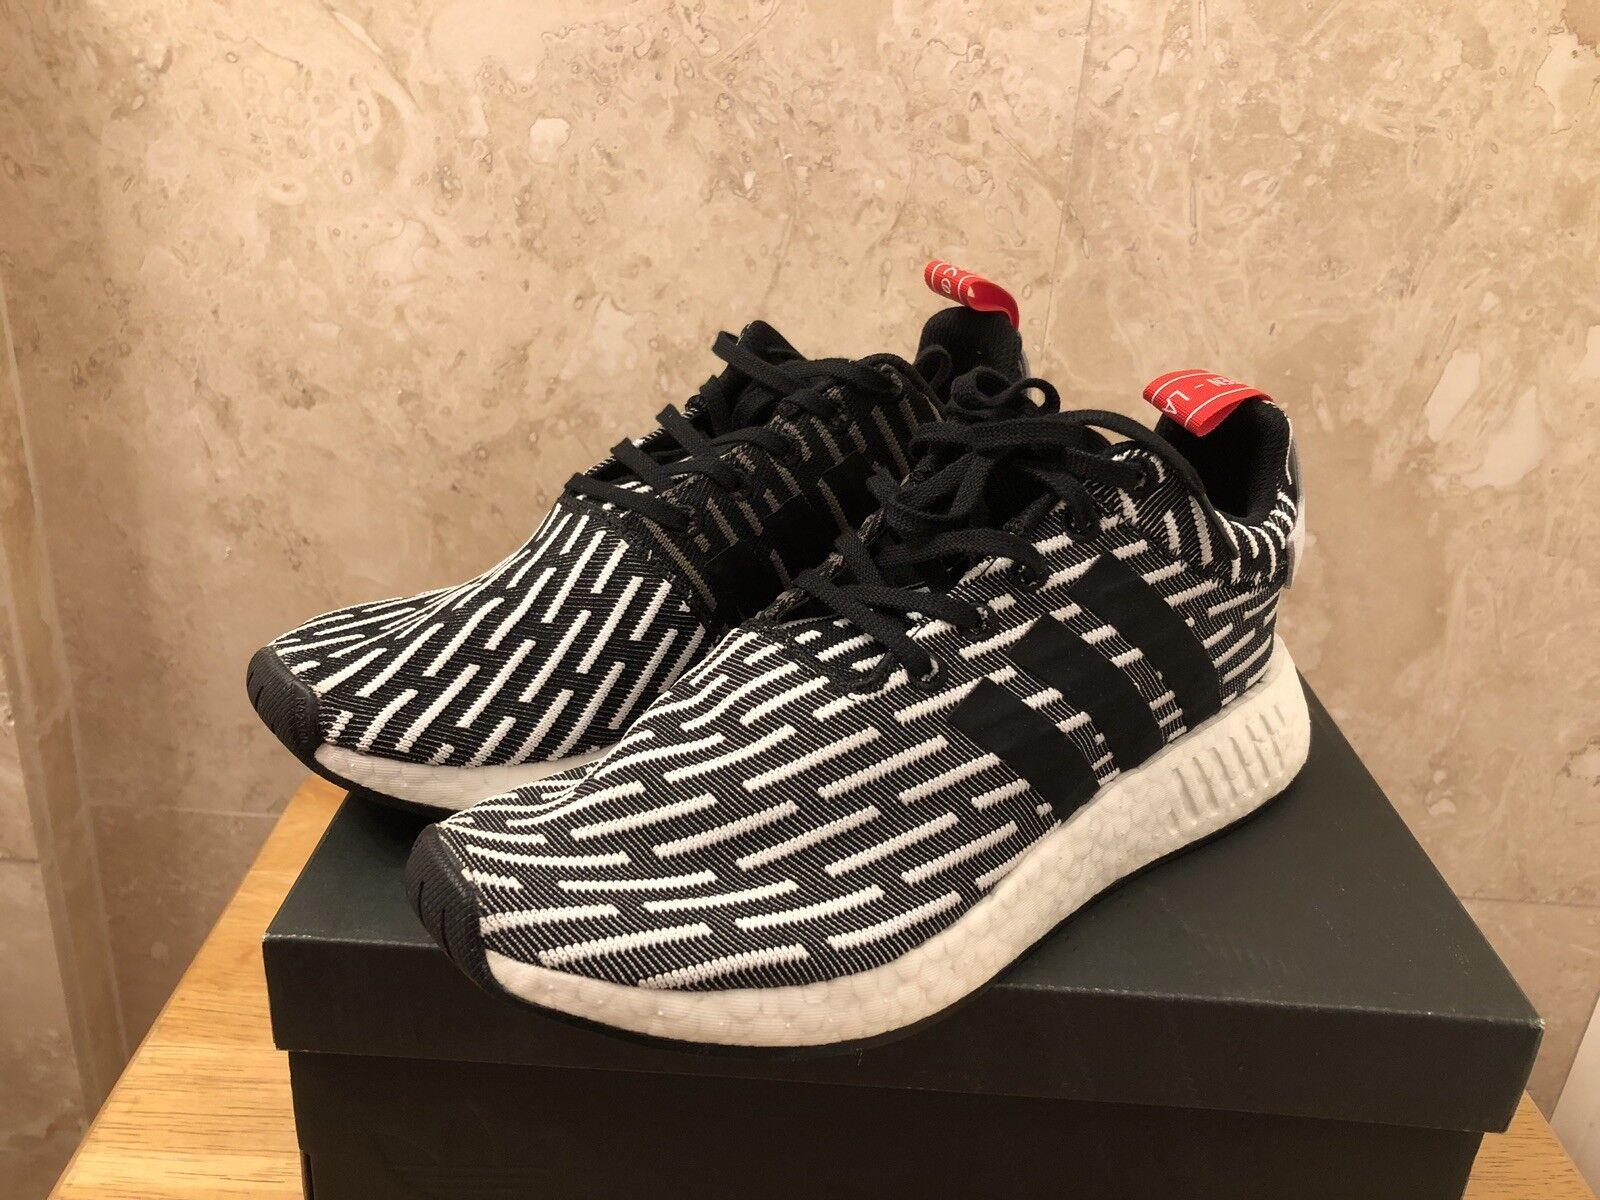 329be8f7f Men s Size 9 Adidas NMD R2 PK Primeknit Primeknit Primeknit Black White  Zebra Stripes - BB2951